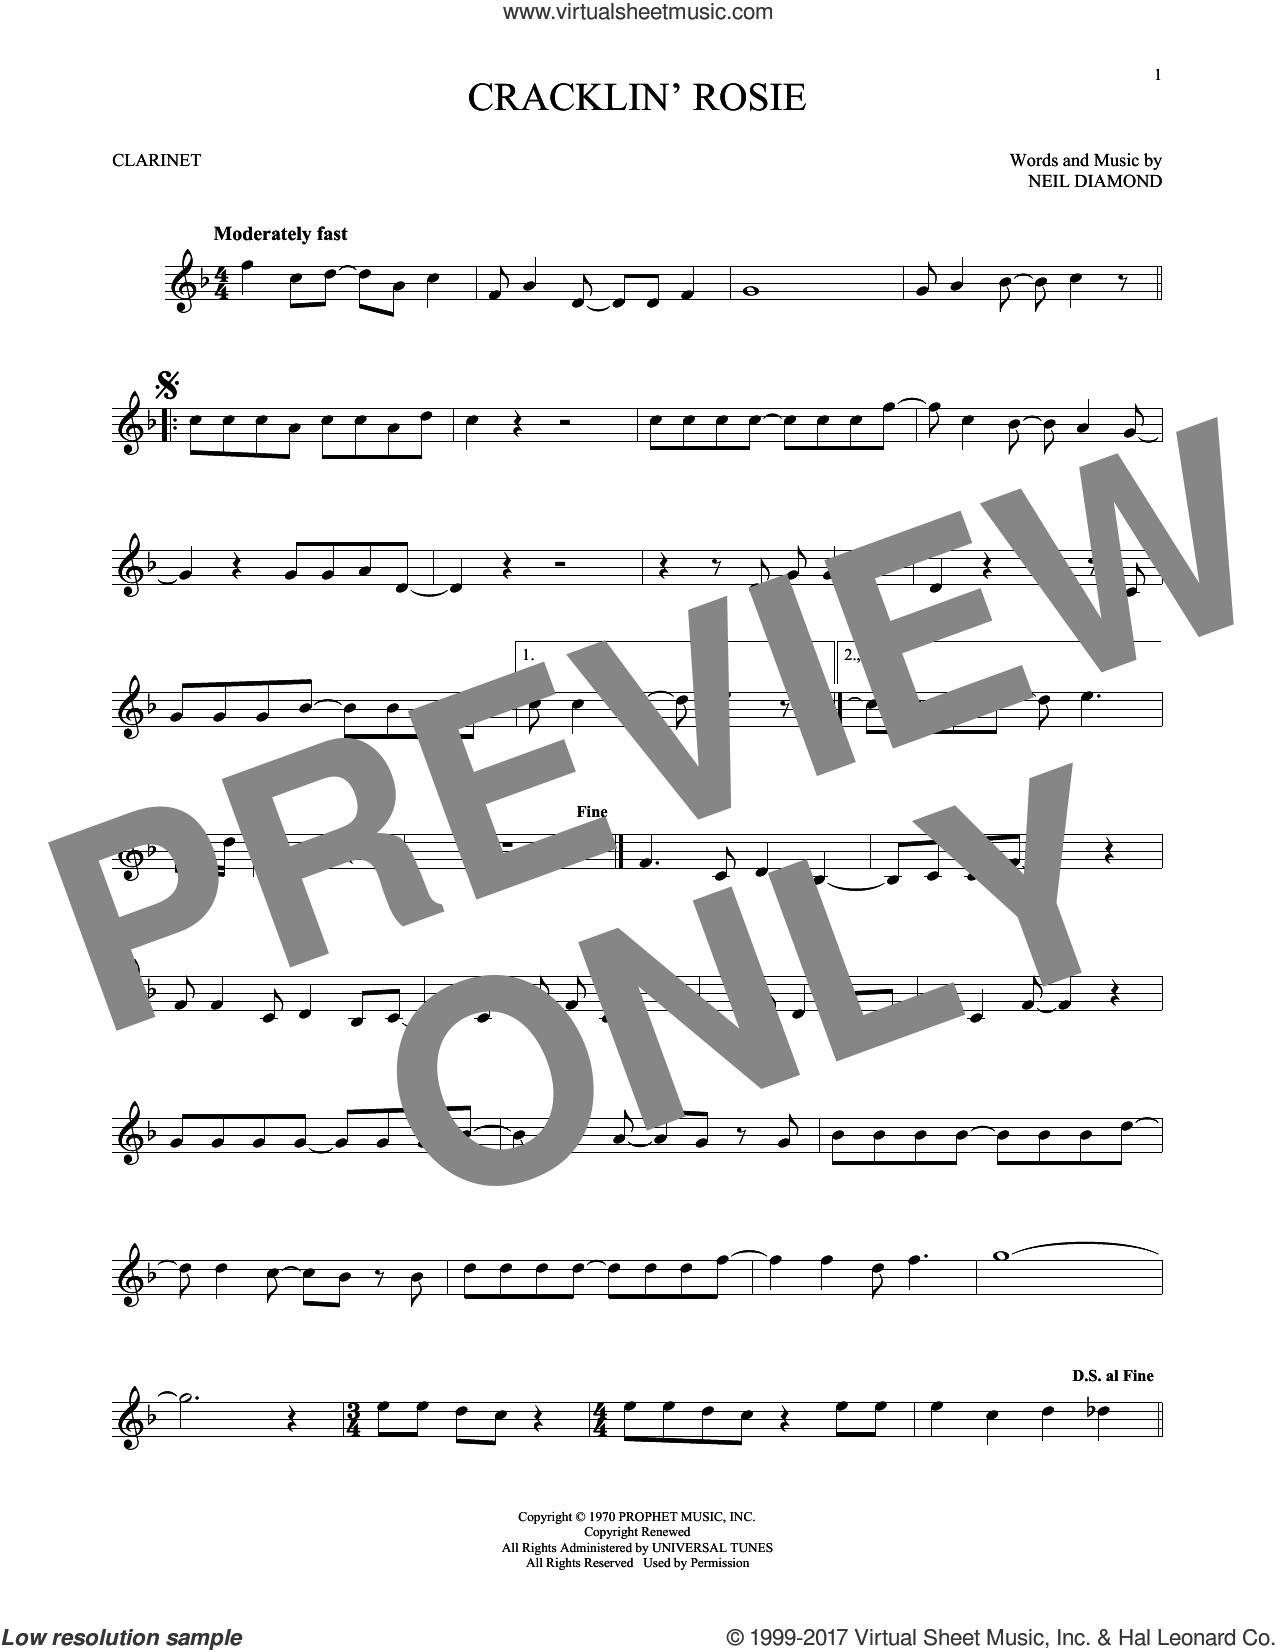 Cracklin' Rosie sheet music for clarinet solo by Neil Diamond, intermediate skill level